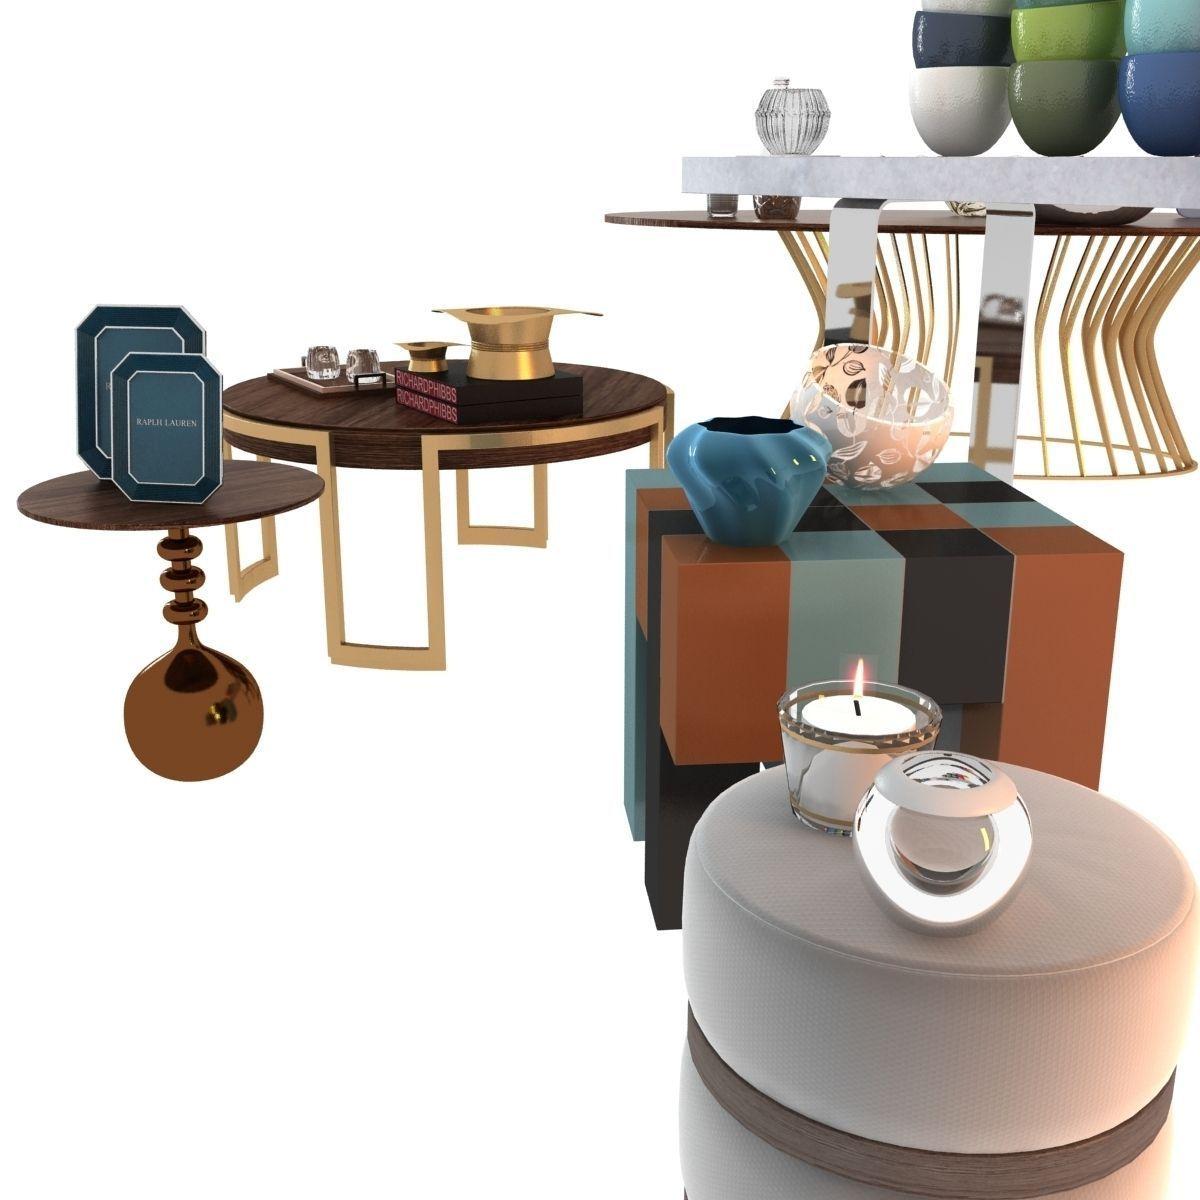 Living room decorative set 3d model max obj 3ds fbx mtl for Decorative items for dining room